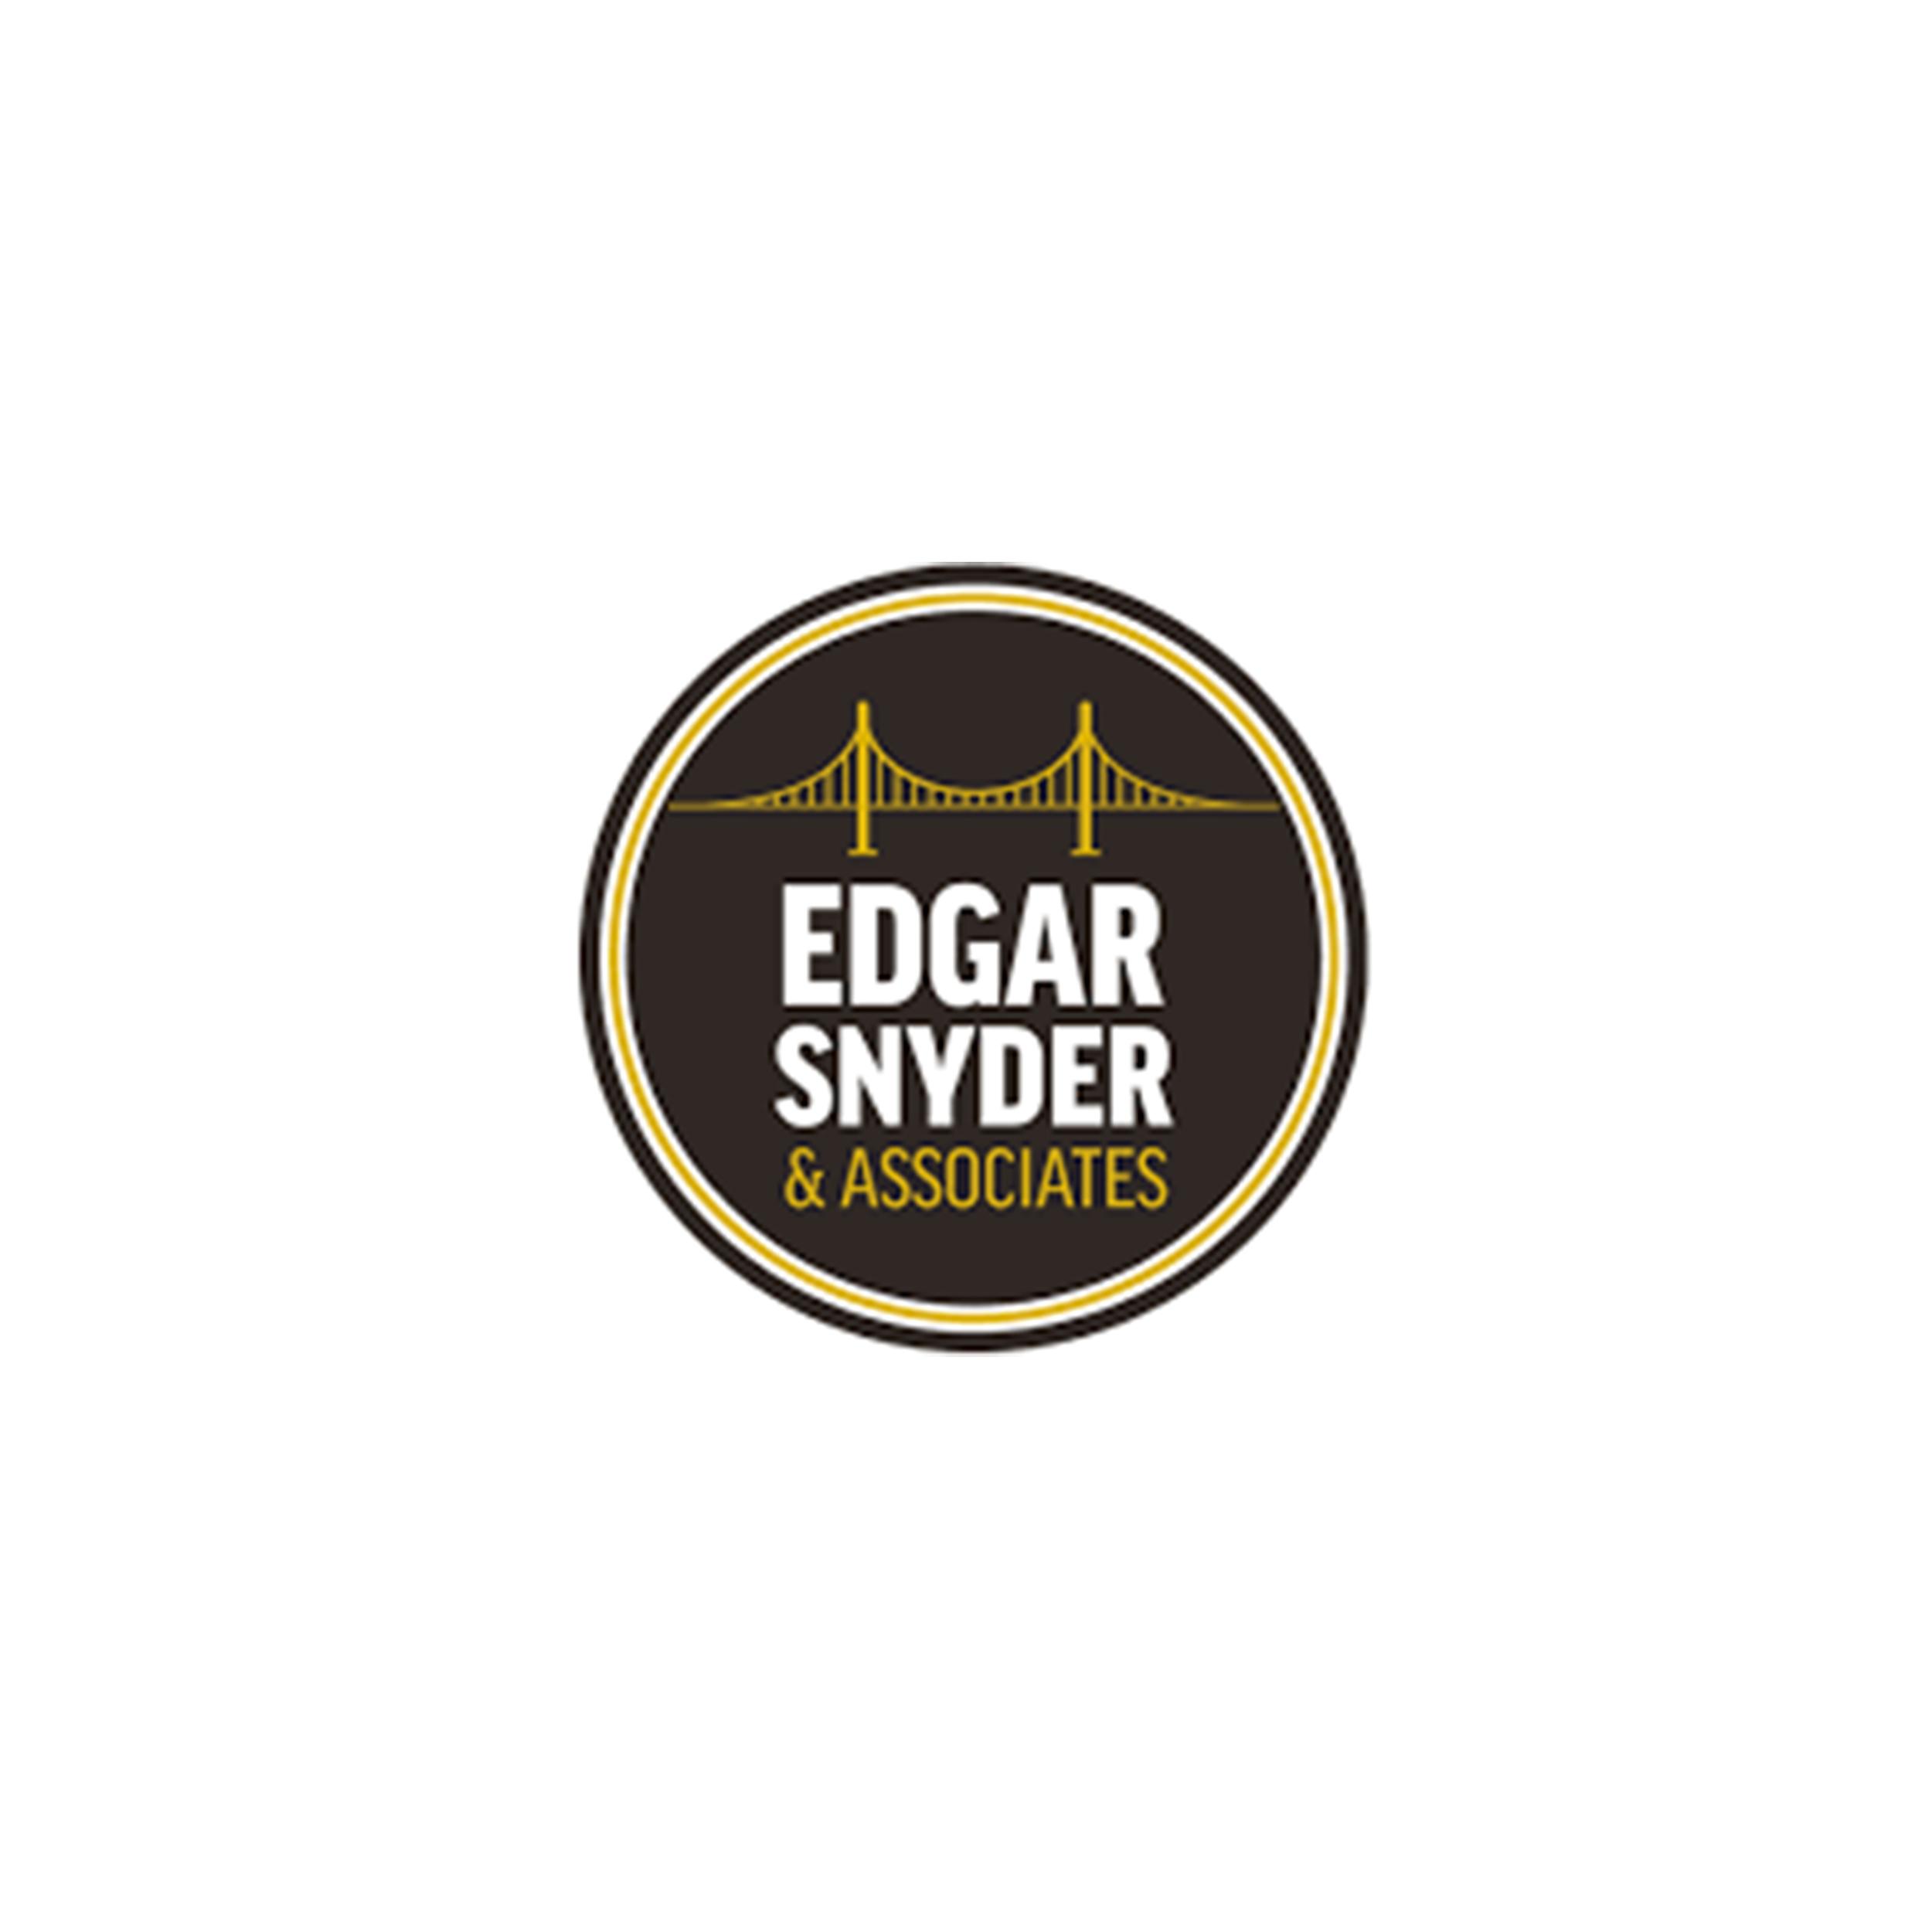 EdgarSnyderWebsite.jpg